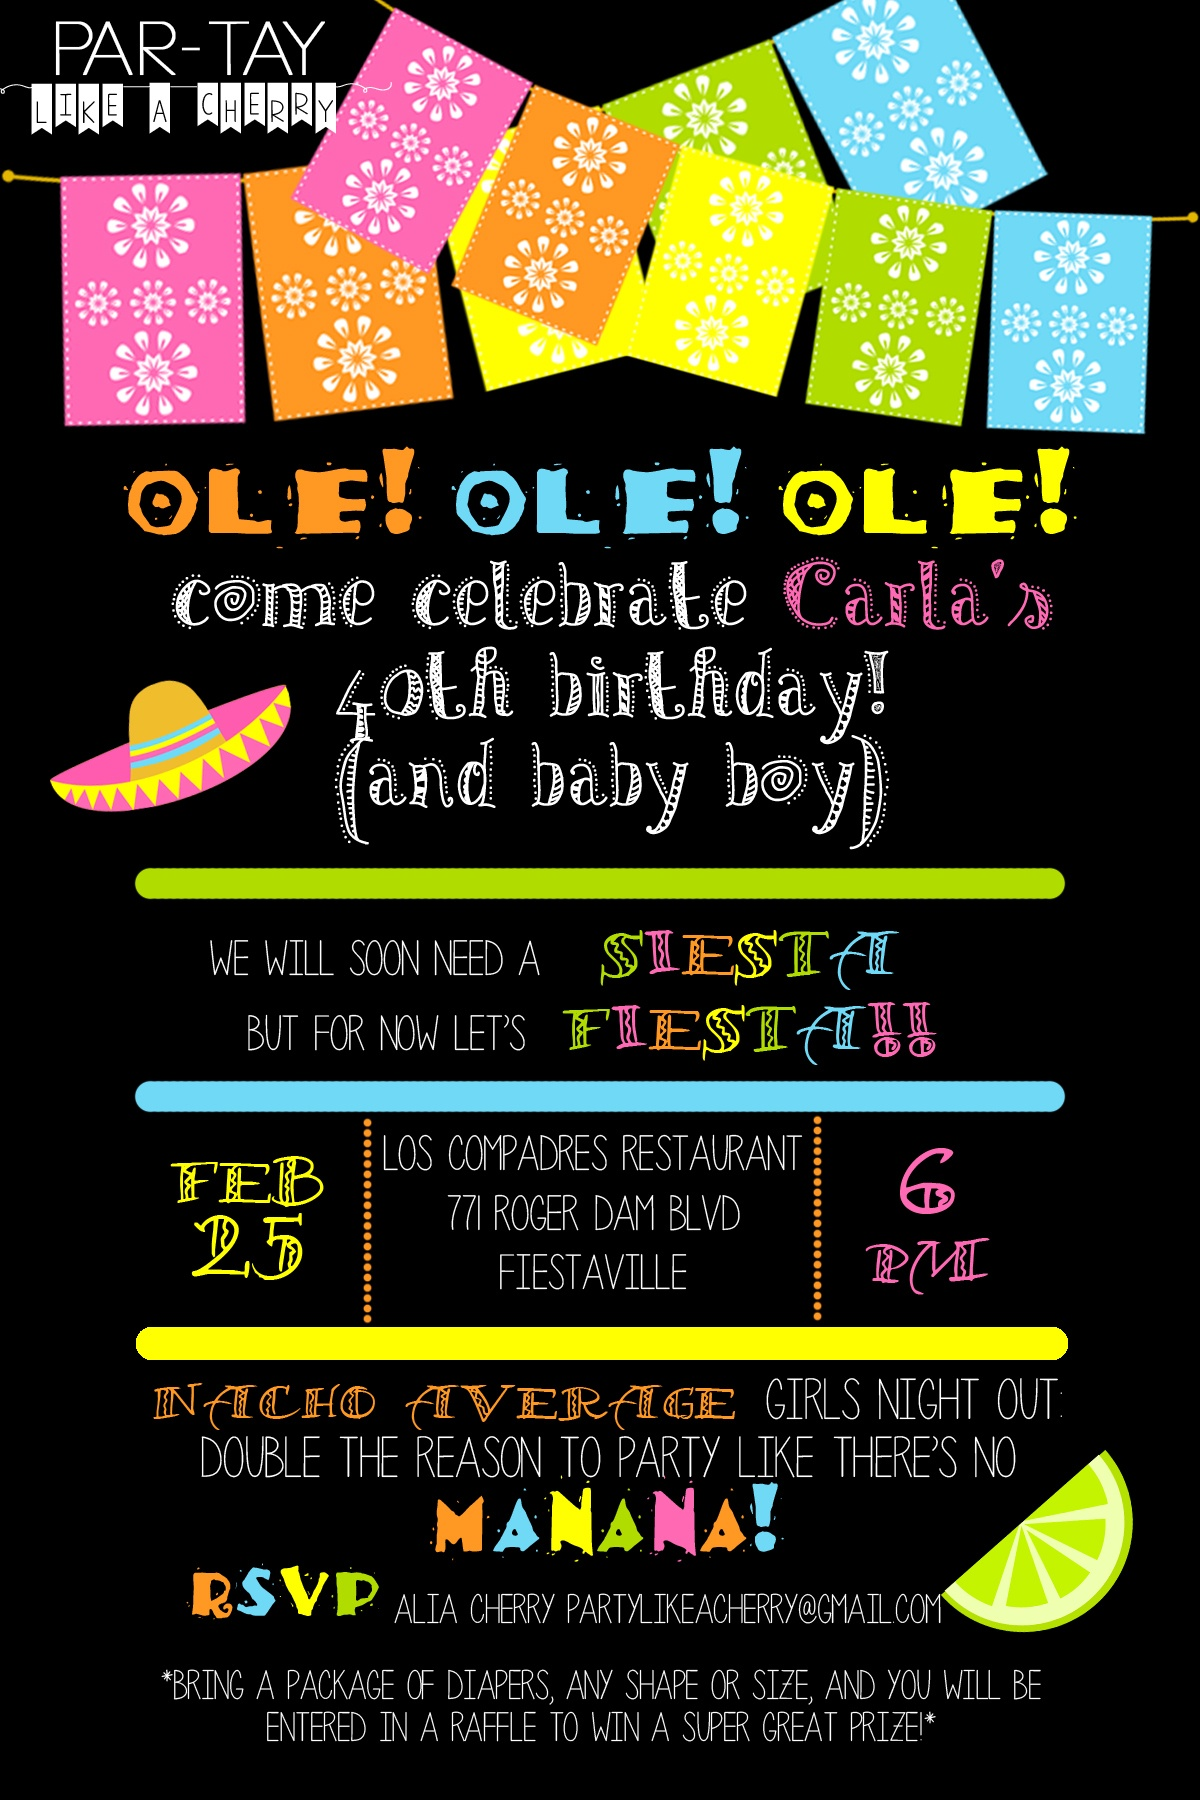 Free Editable Fiesta Invitation - Party Like A Cherry - Free Printable Mexican Fiesta Invitations